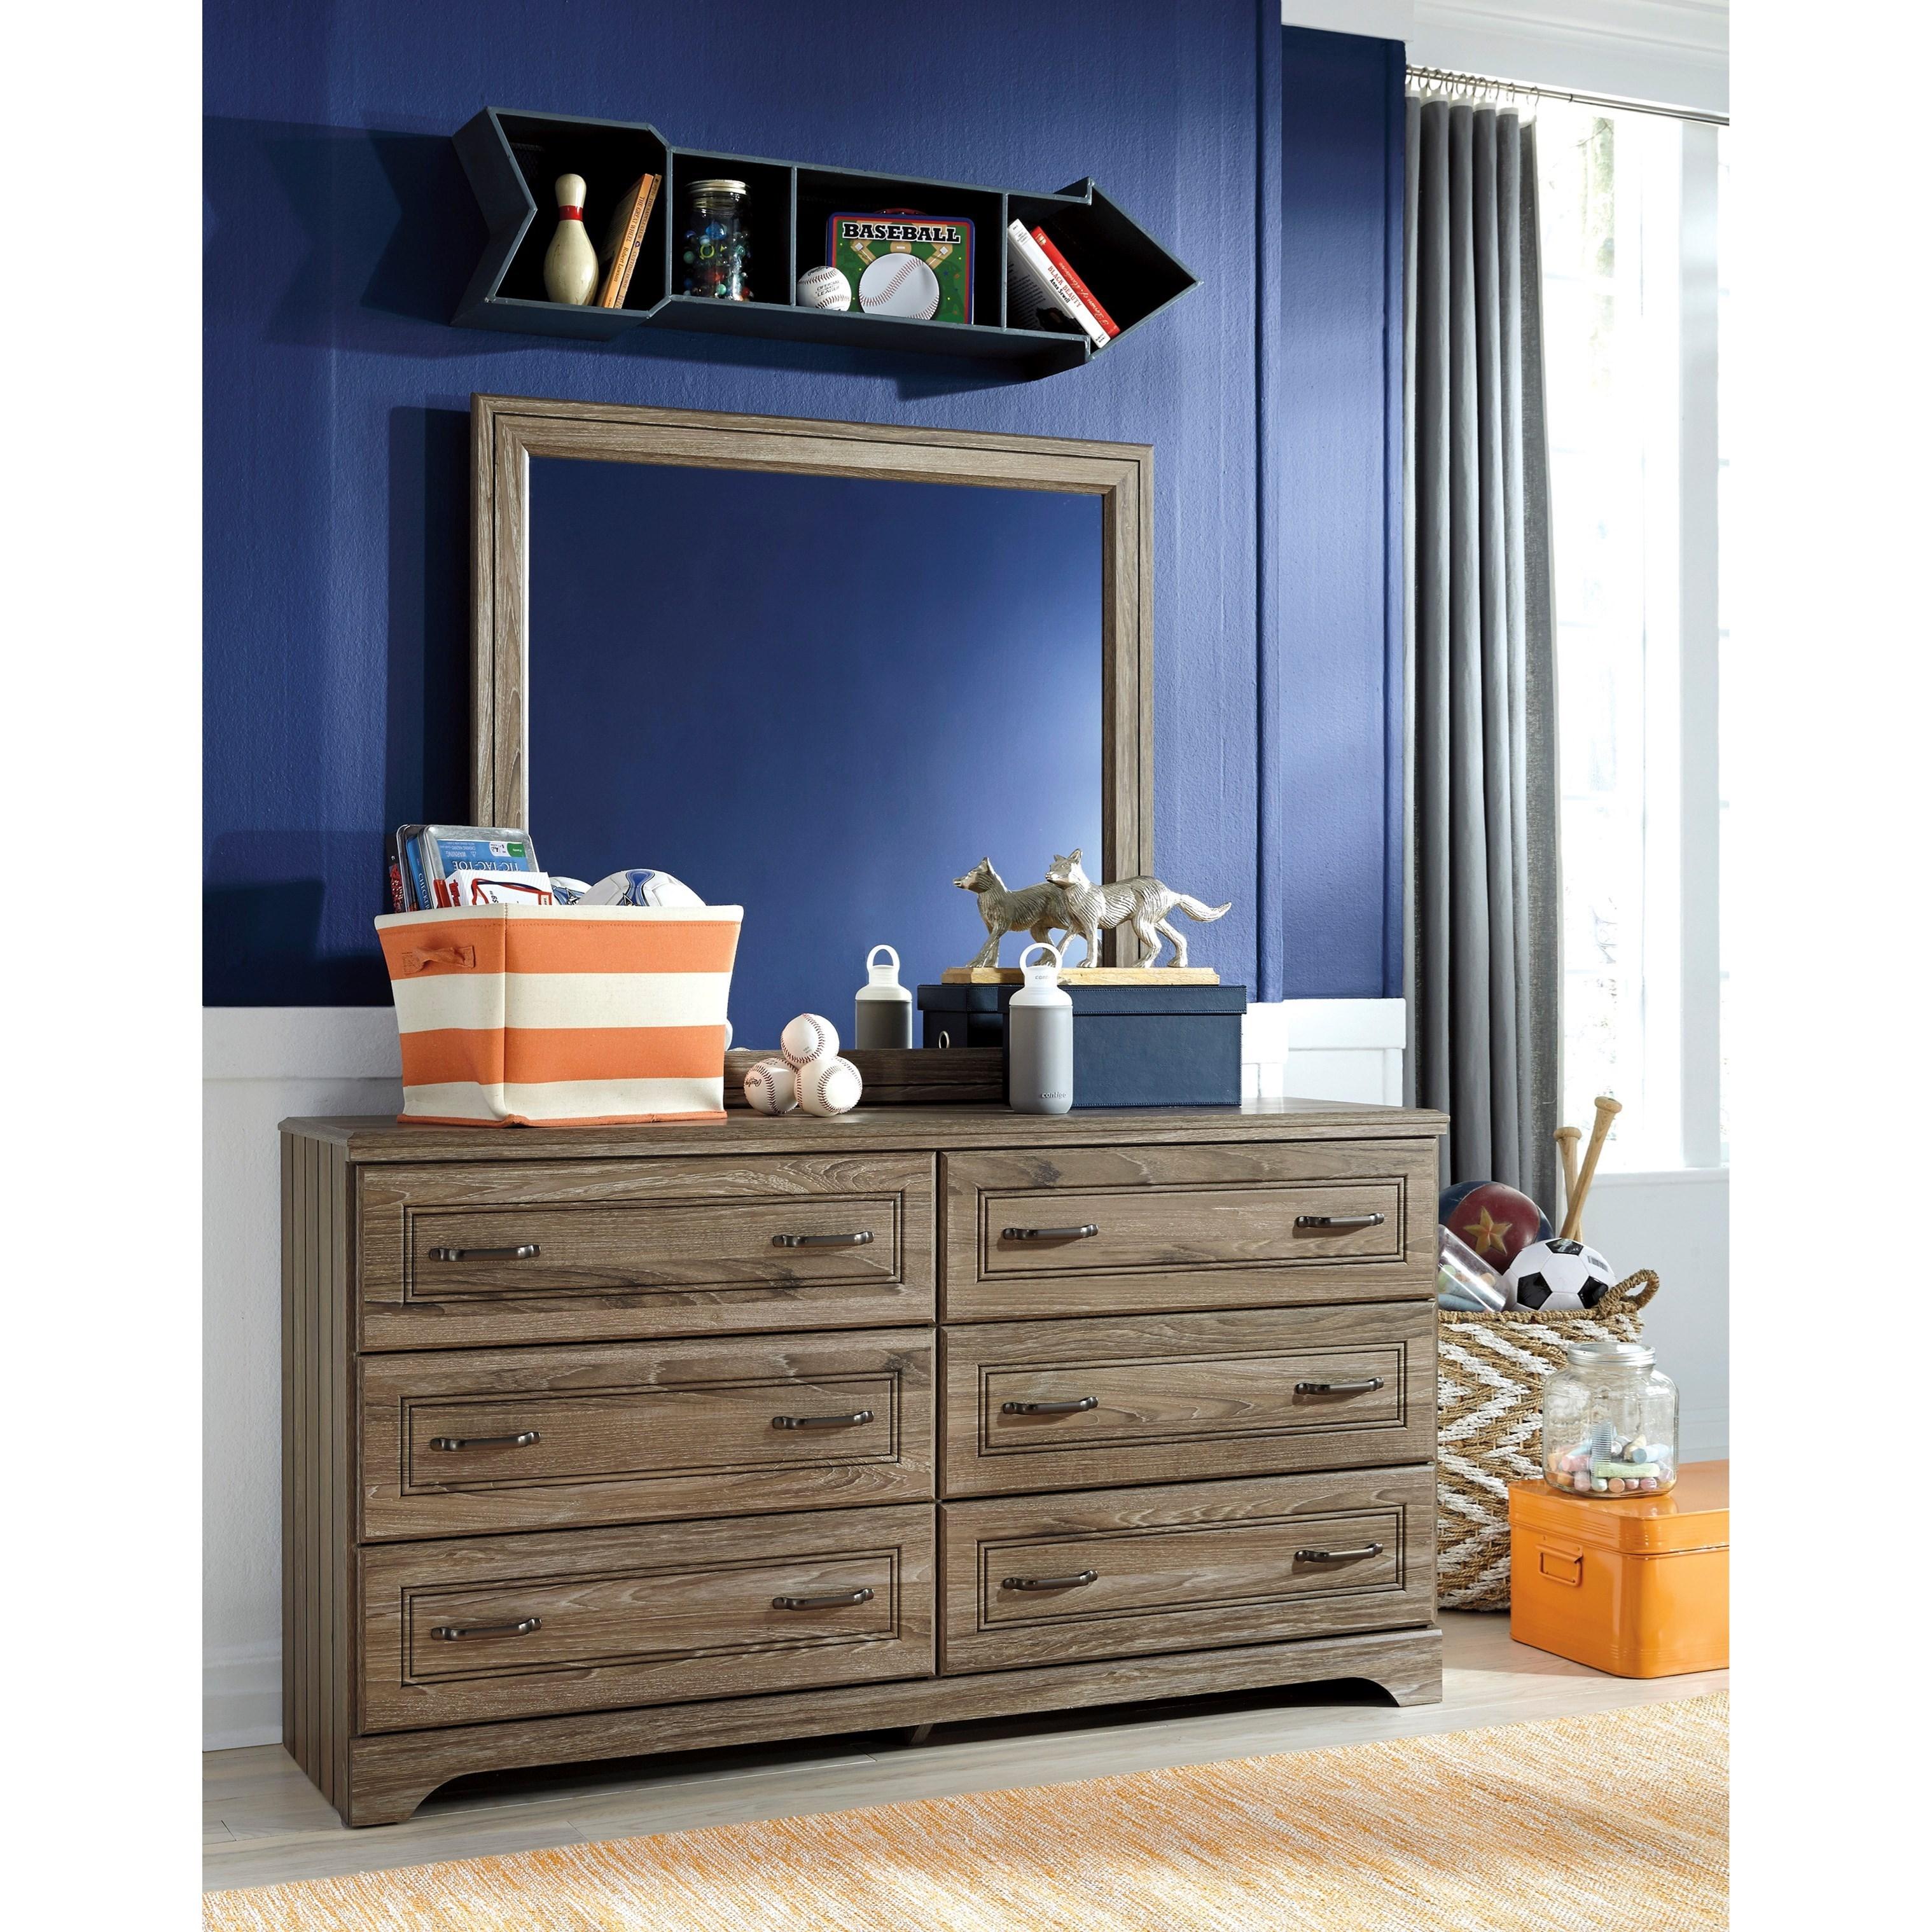 Signature Design by Ashley Javarin Dresser & Bedroom Mirror Beck s